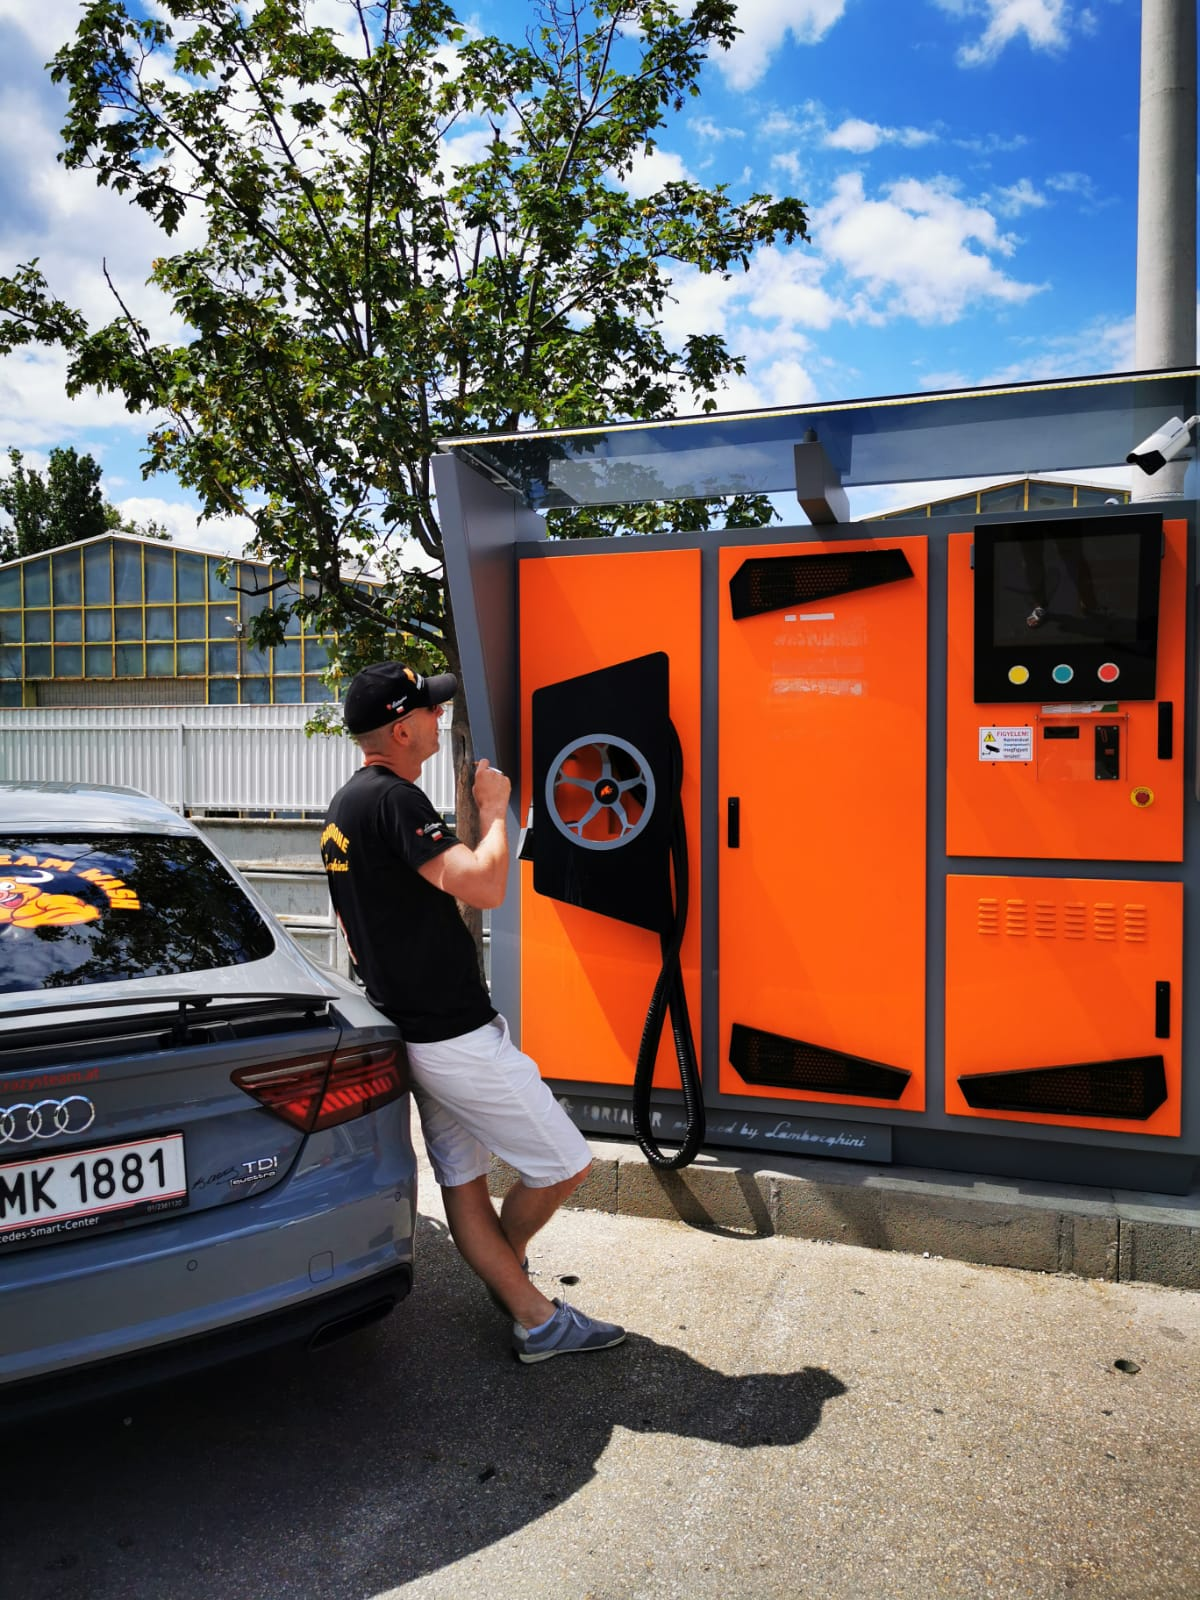 self service car wash machine